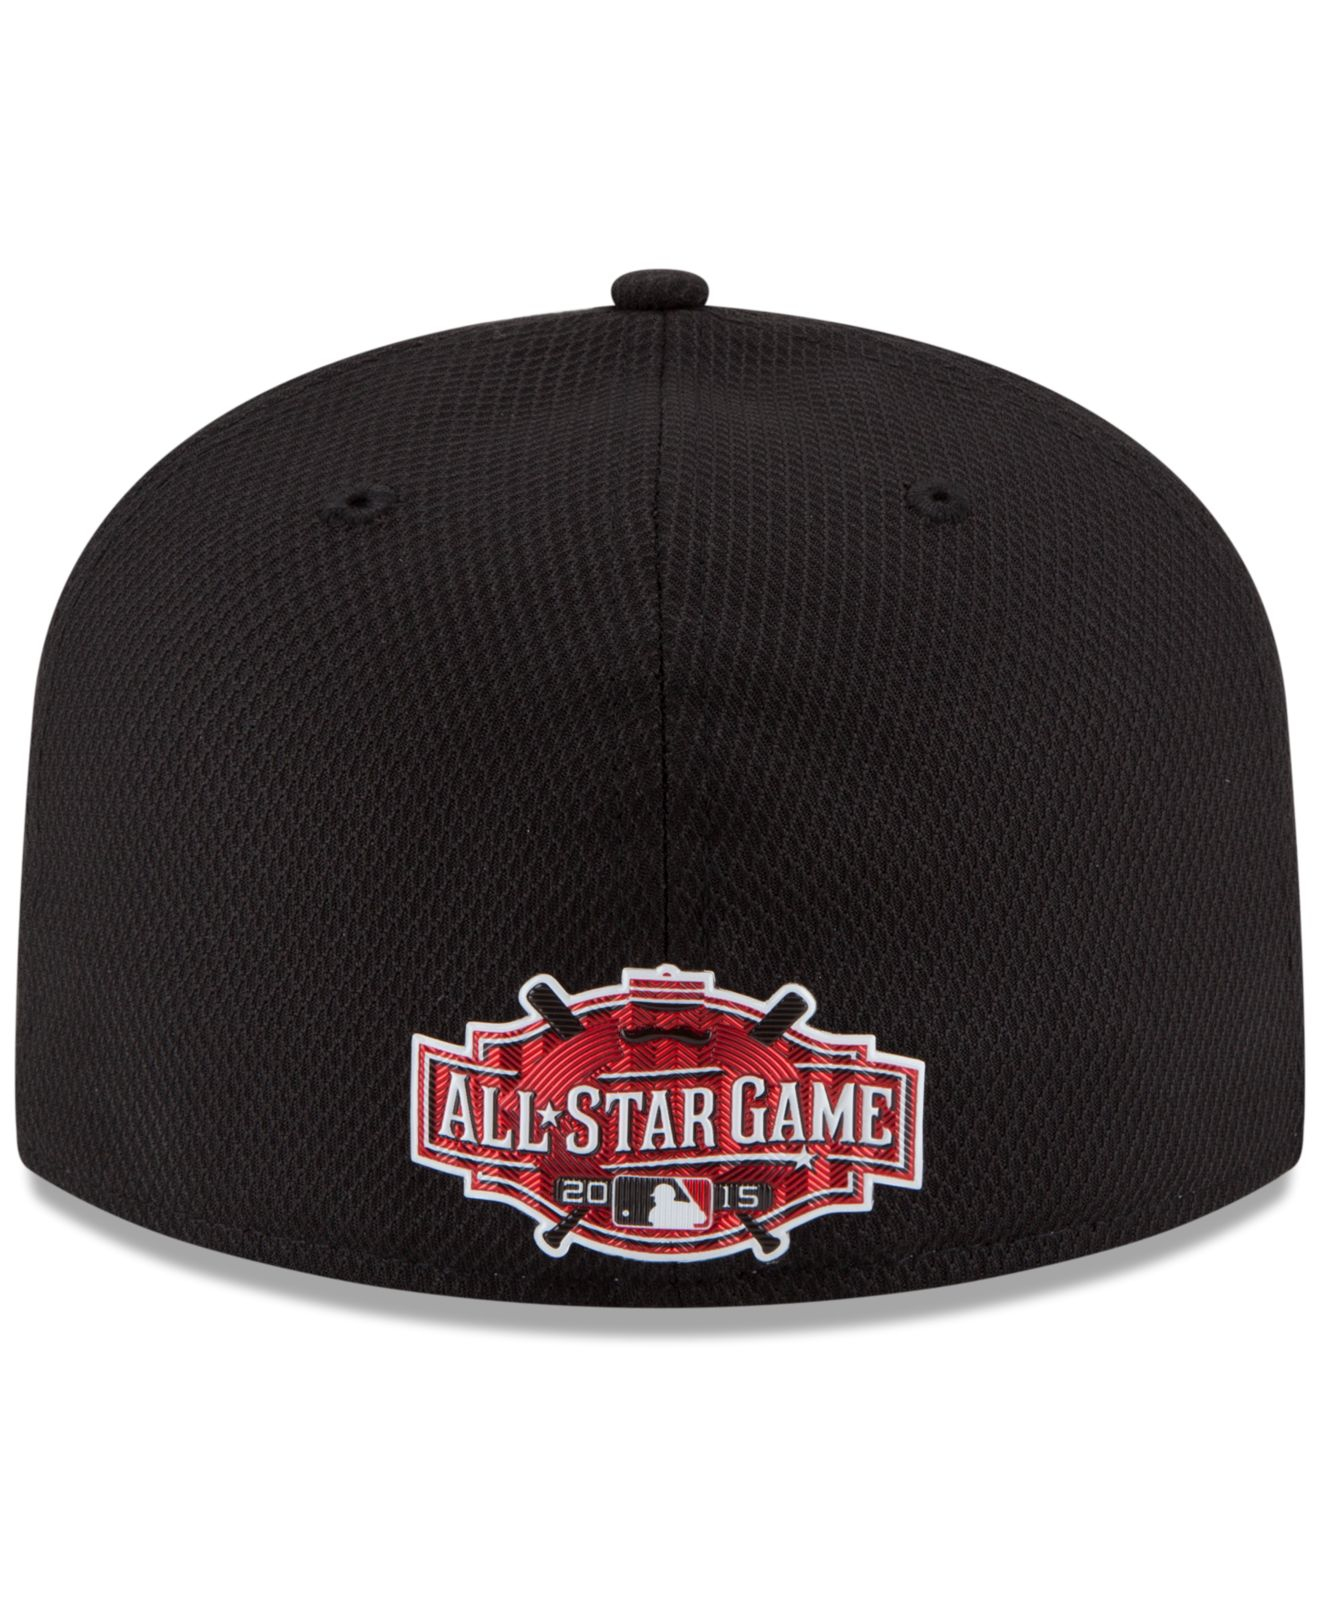 pretty nice 6d770 c81a3 ... mlb caps hats black white id2712new era logonew b7667 fa34f  promo code  for lyst ktz pittsburgh pirates 2015 all star game 59fifty cap in 9cd3b  44b02